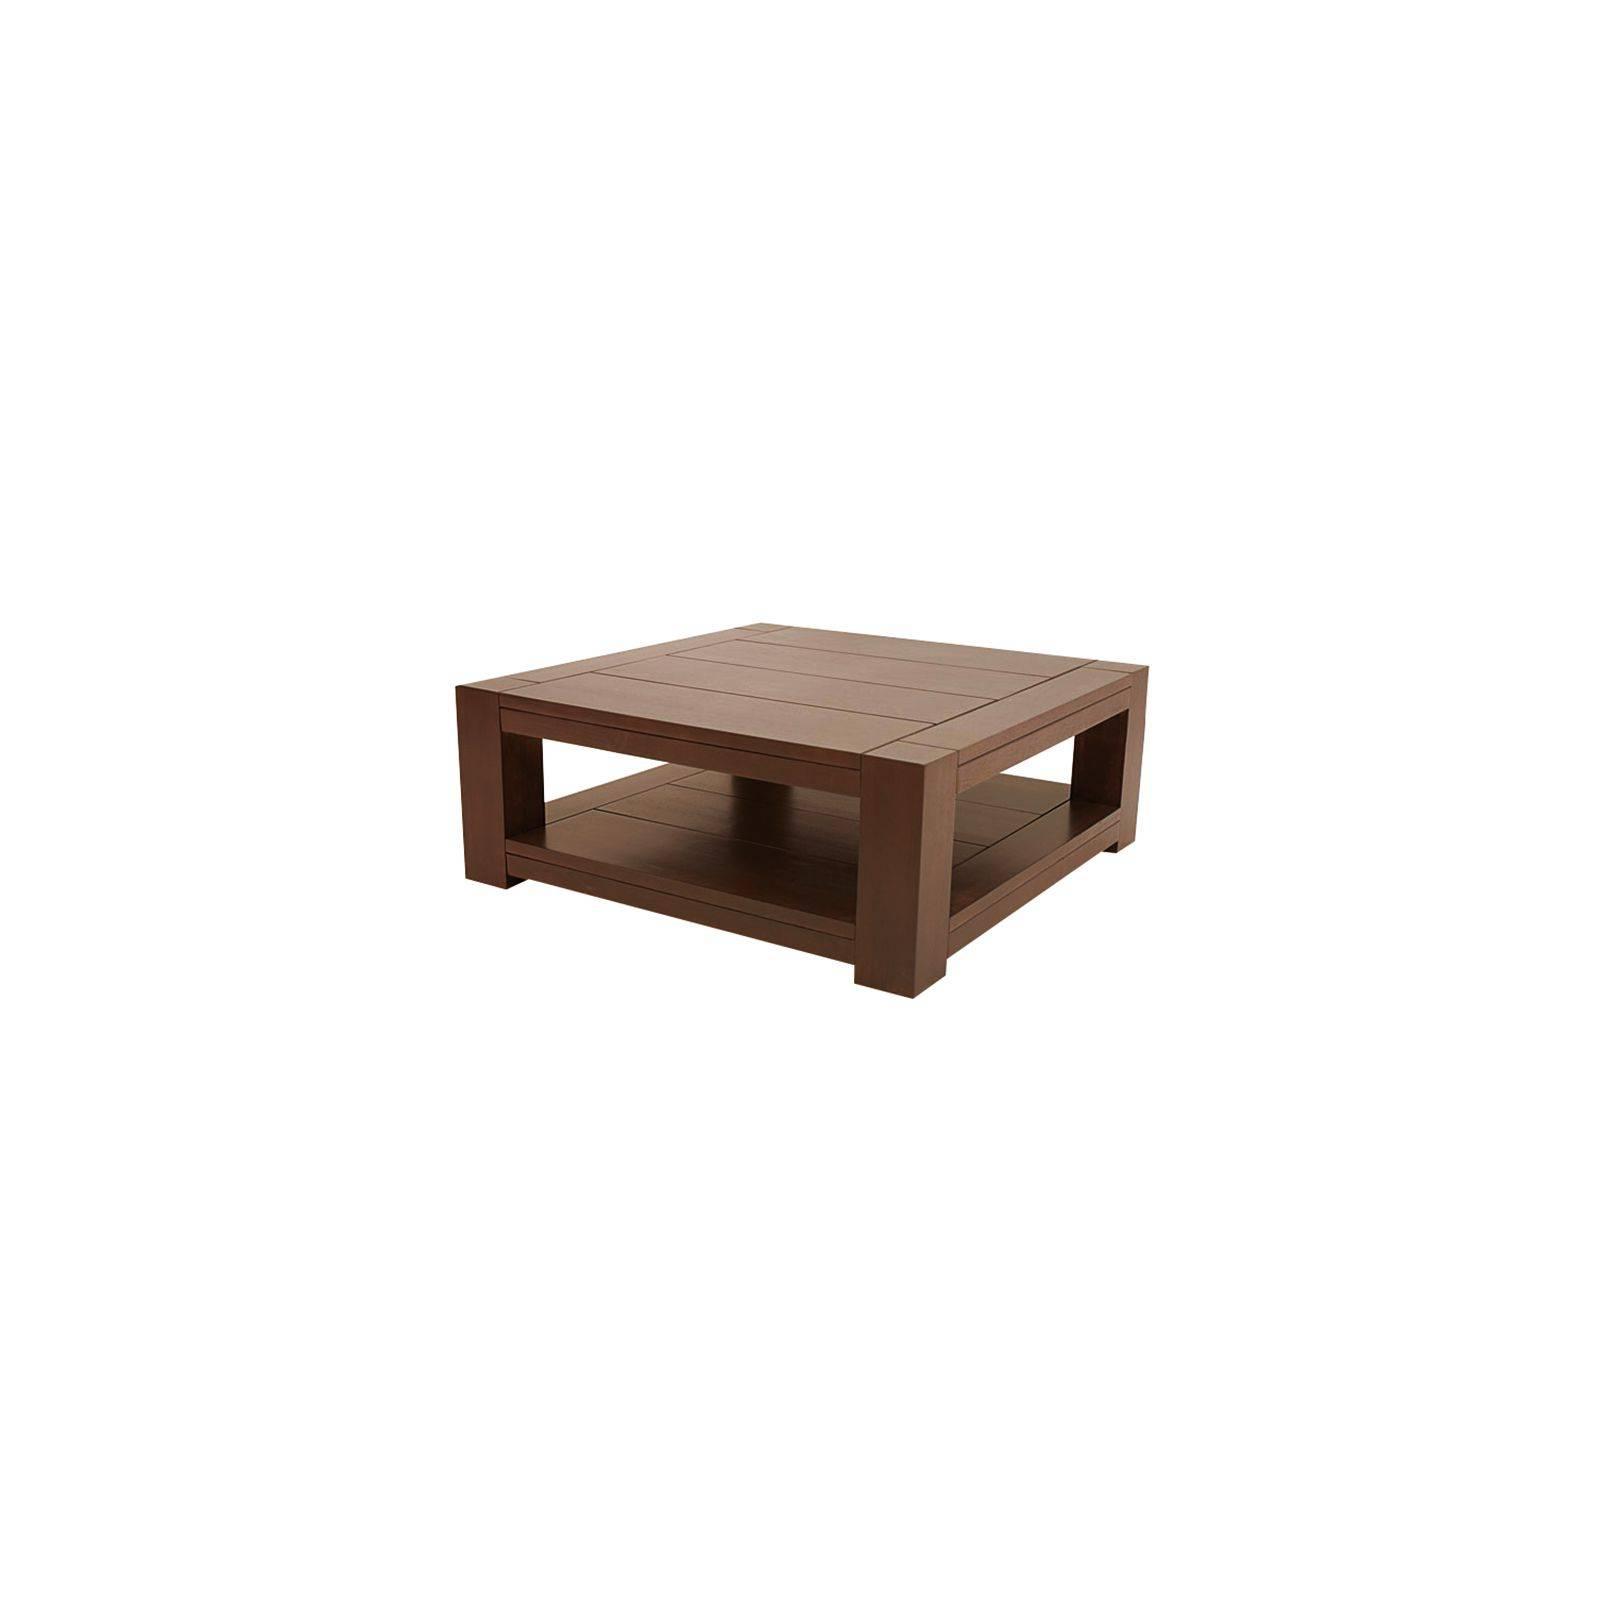 Table basse carrée en hévéa. Mobilier design Moka